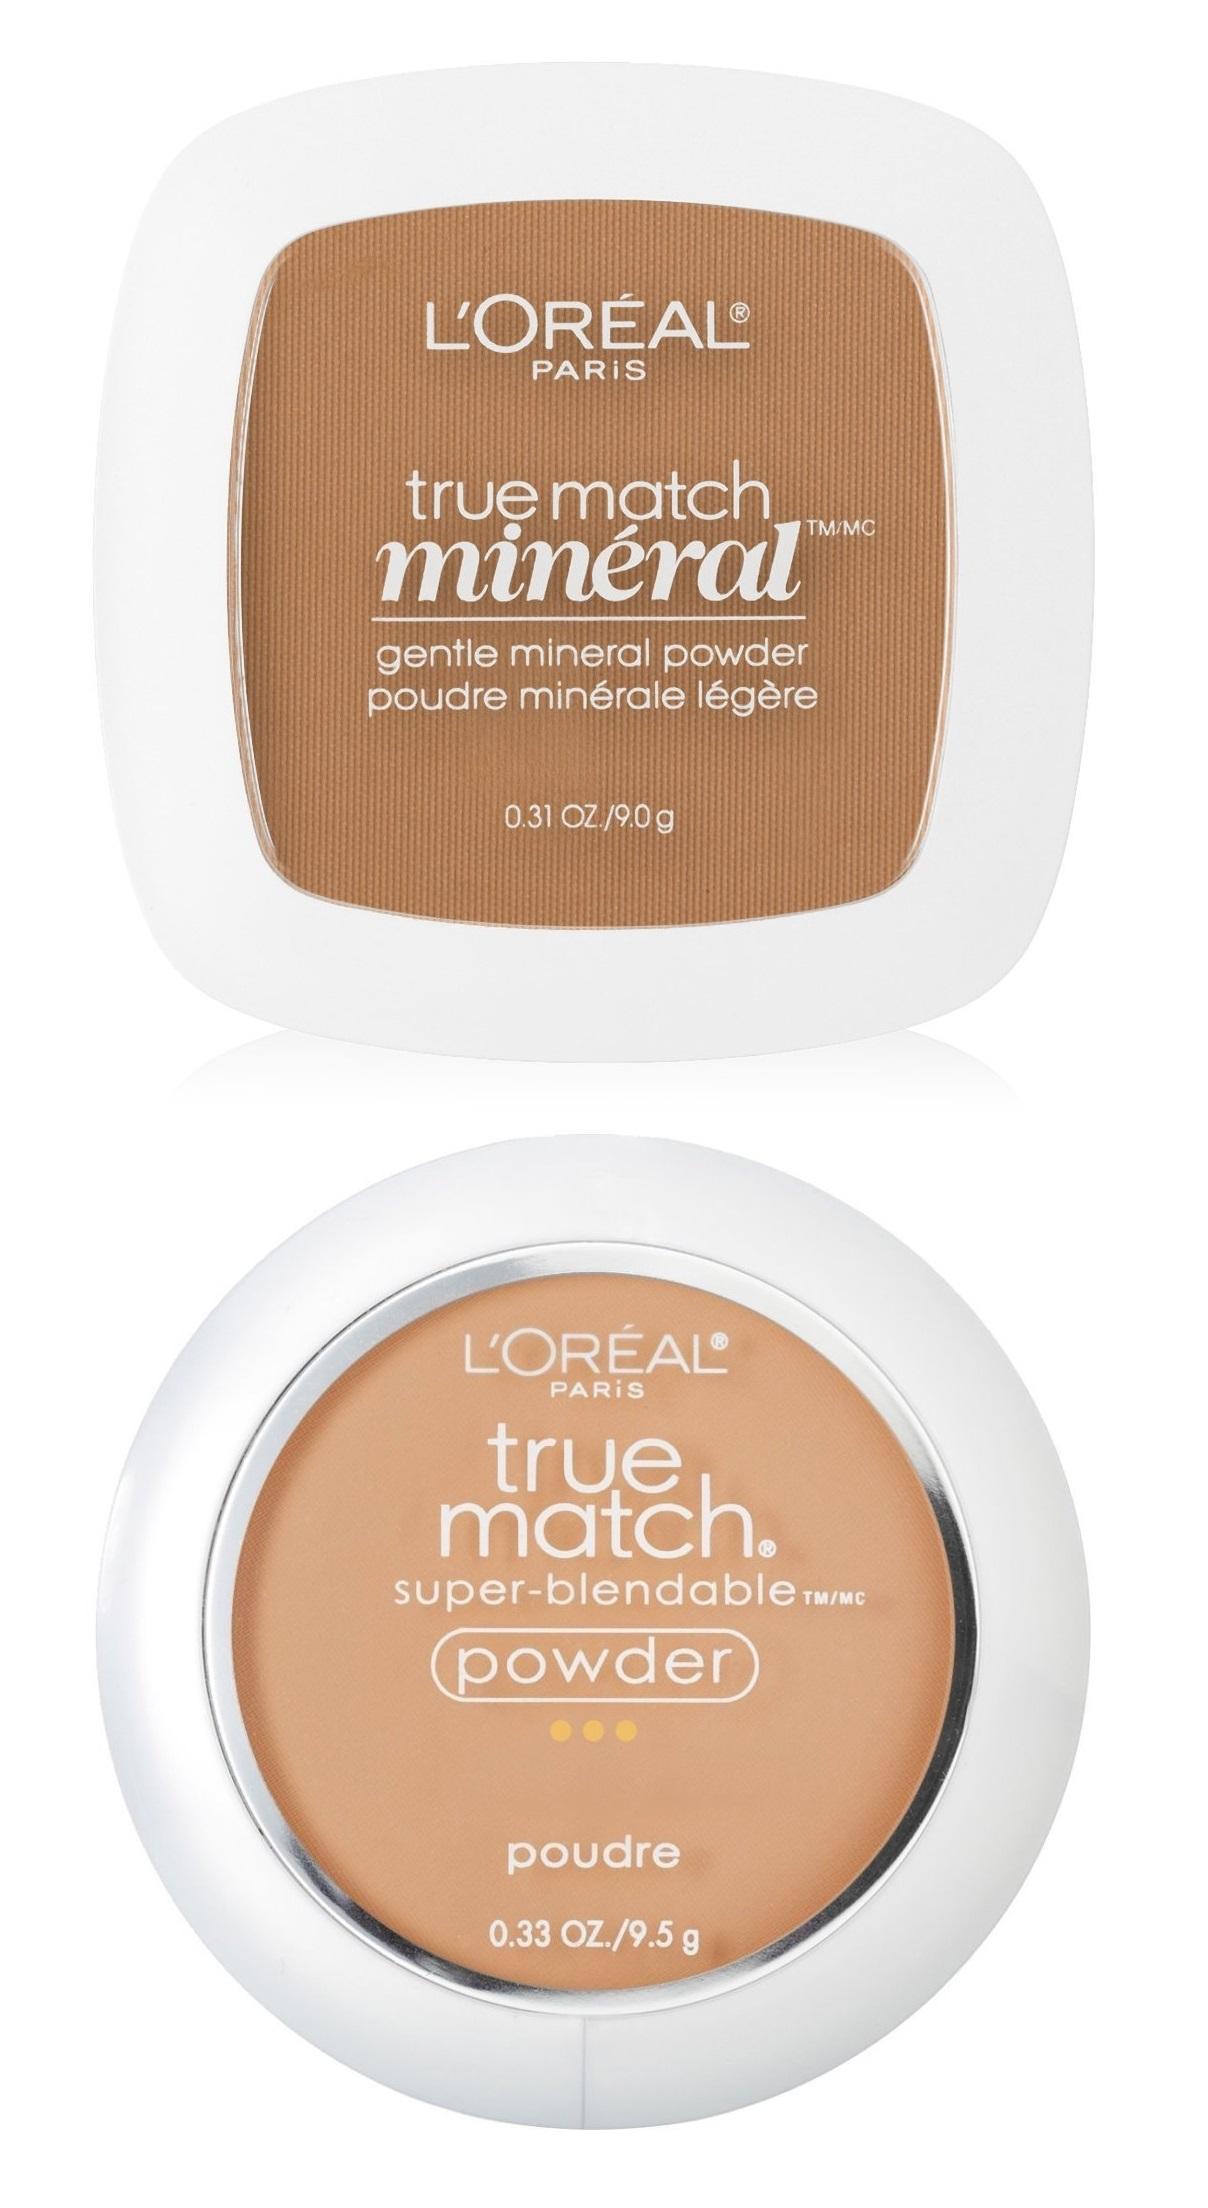 L'Oreal Paris True Match™ Minéral Pressed Powder and True Match™ Powder